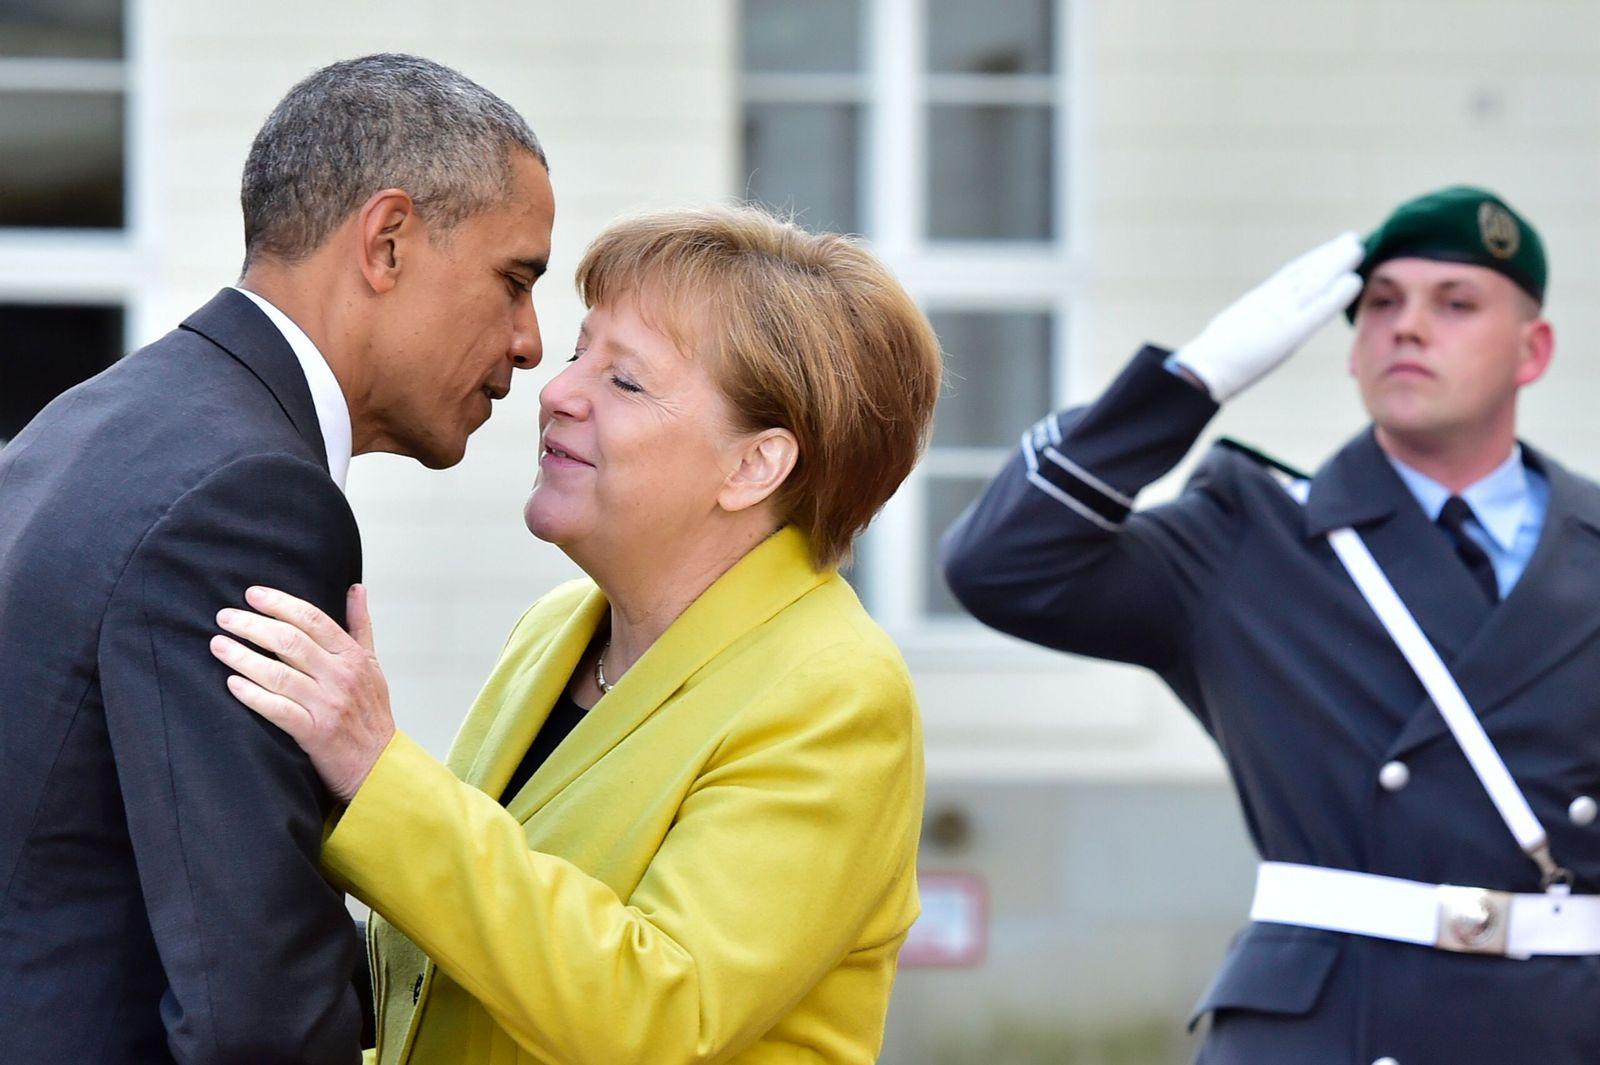 Barack Obama/ Angela Merkel/ Herrenhausen